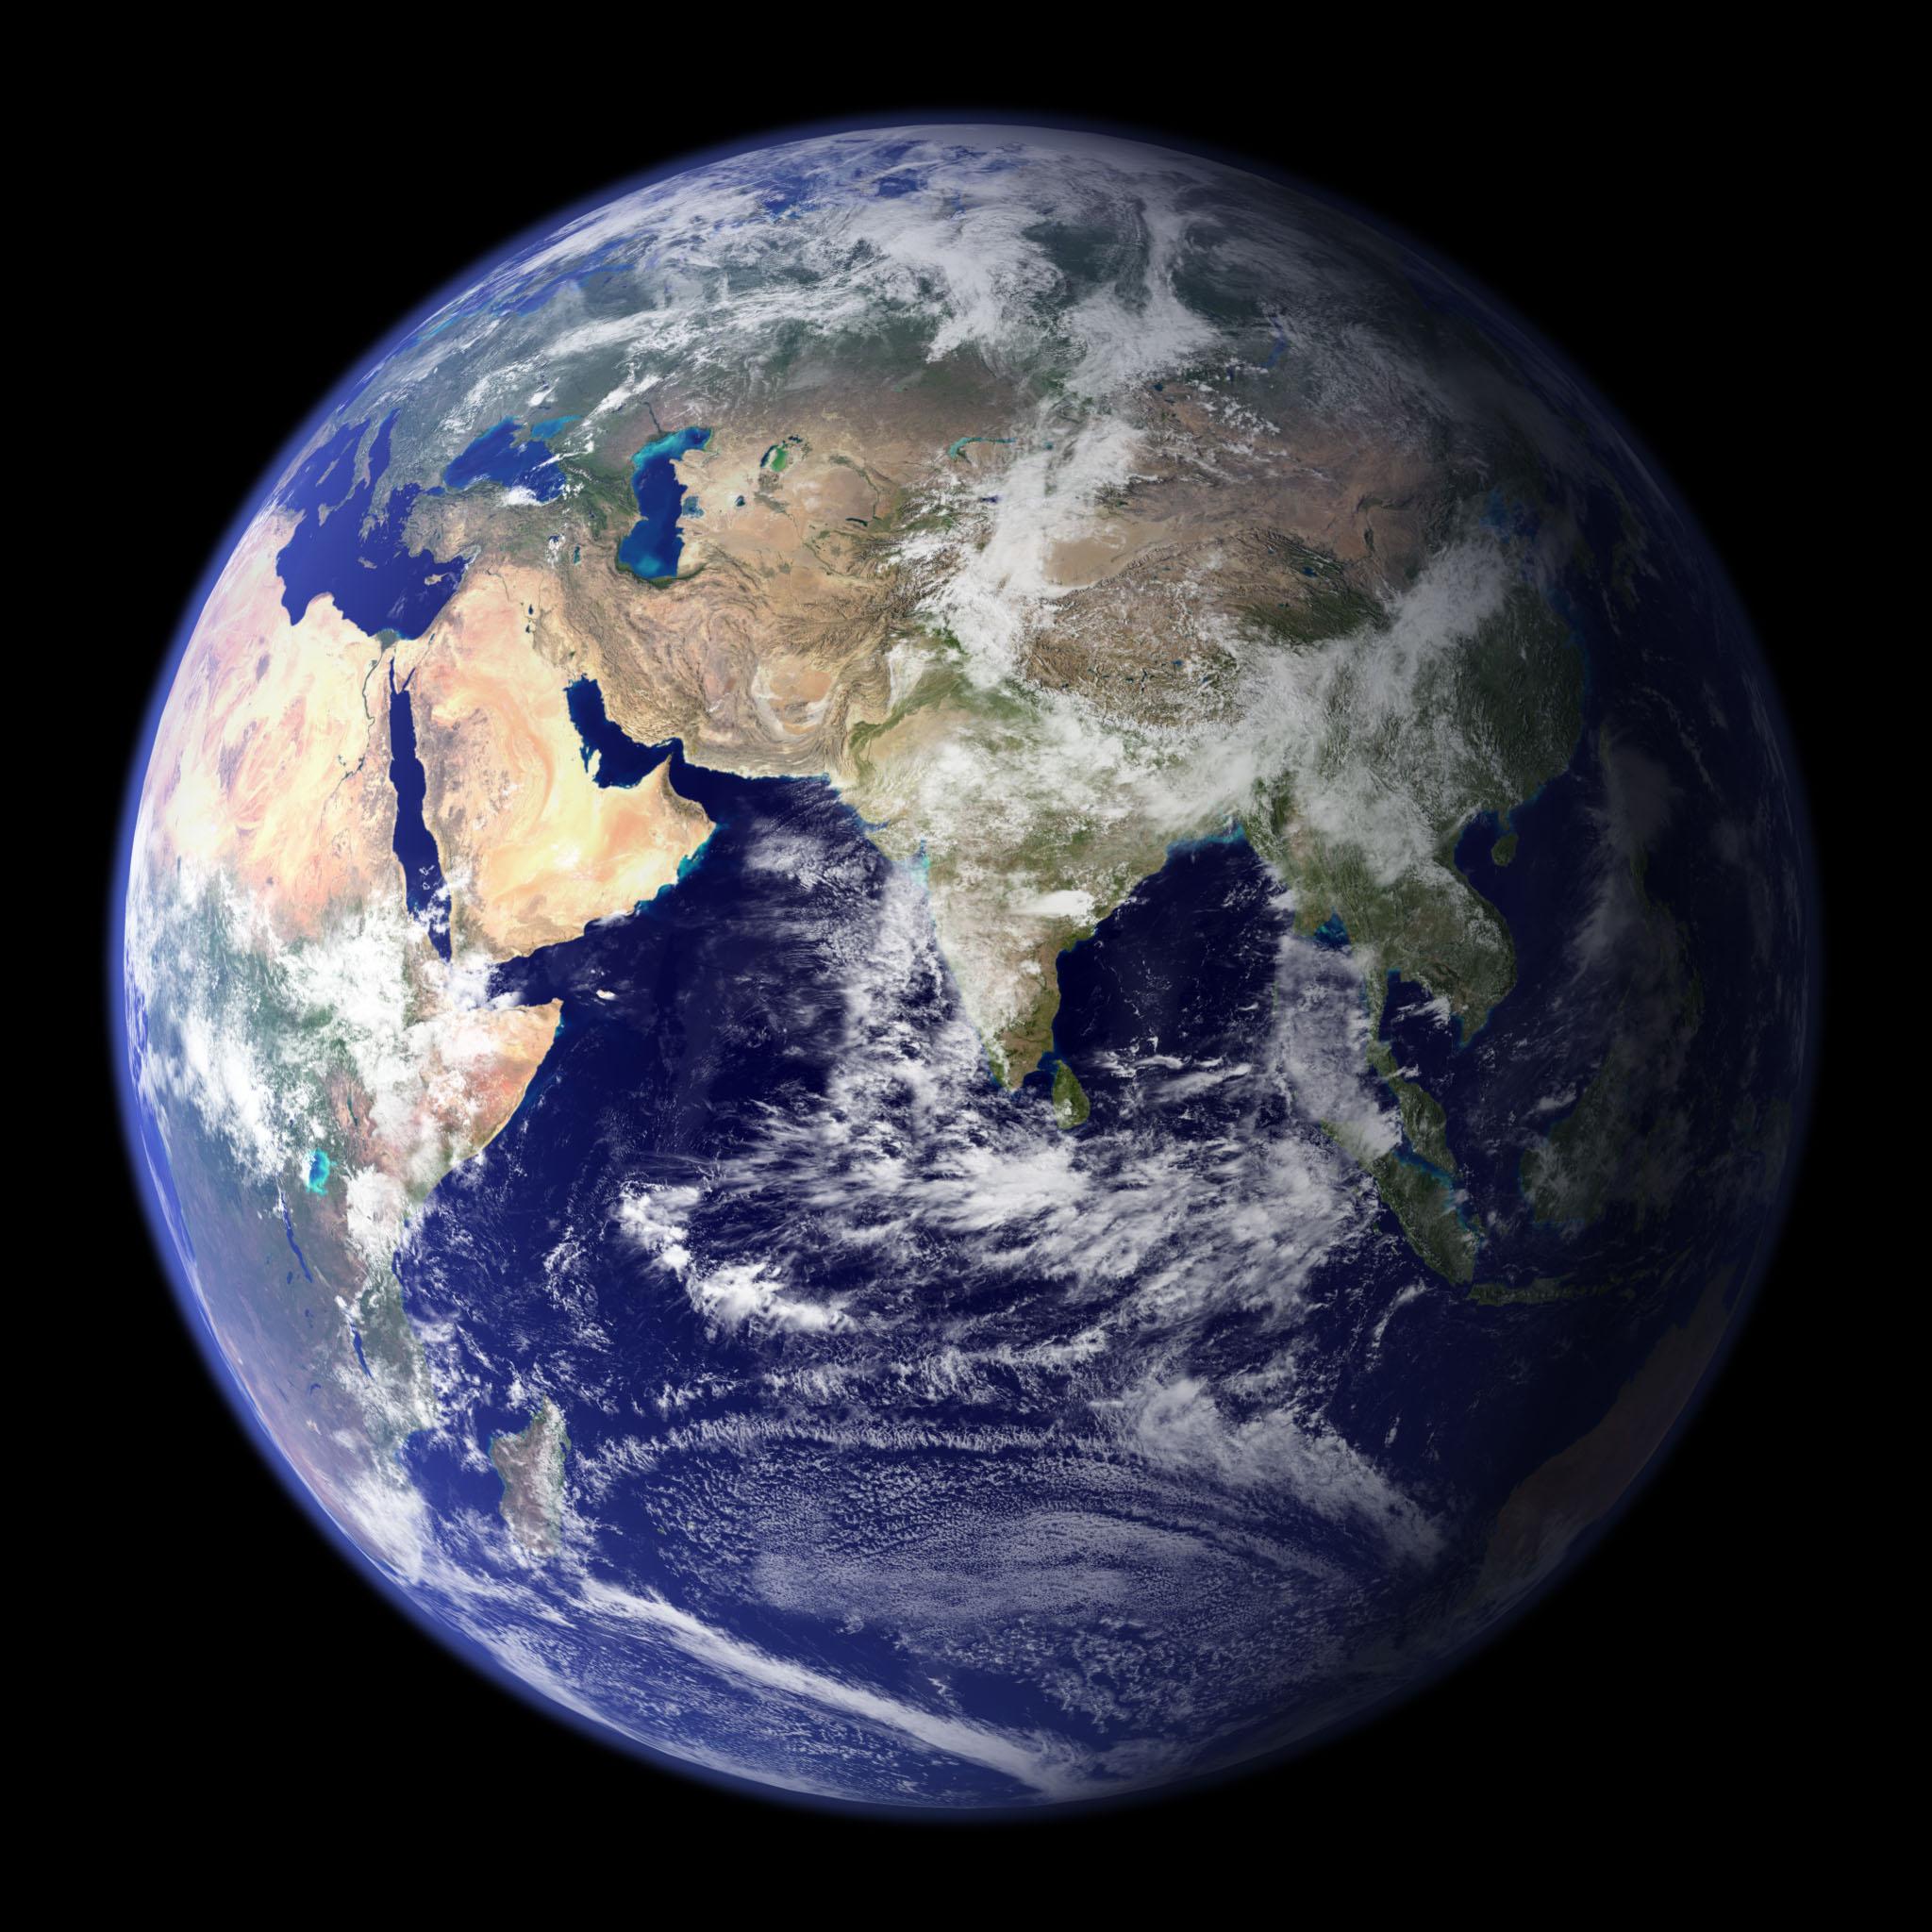 blue planet NASA